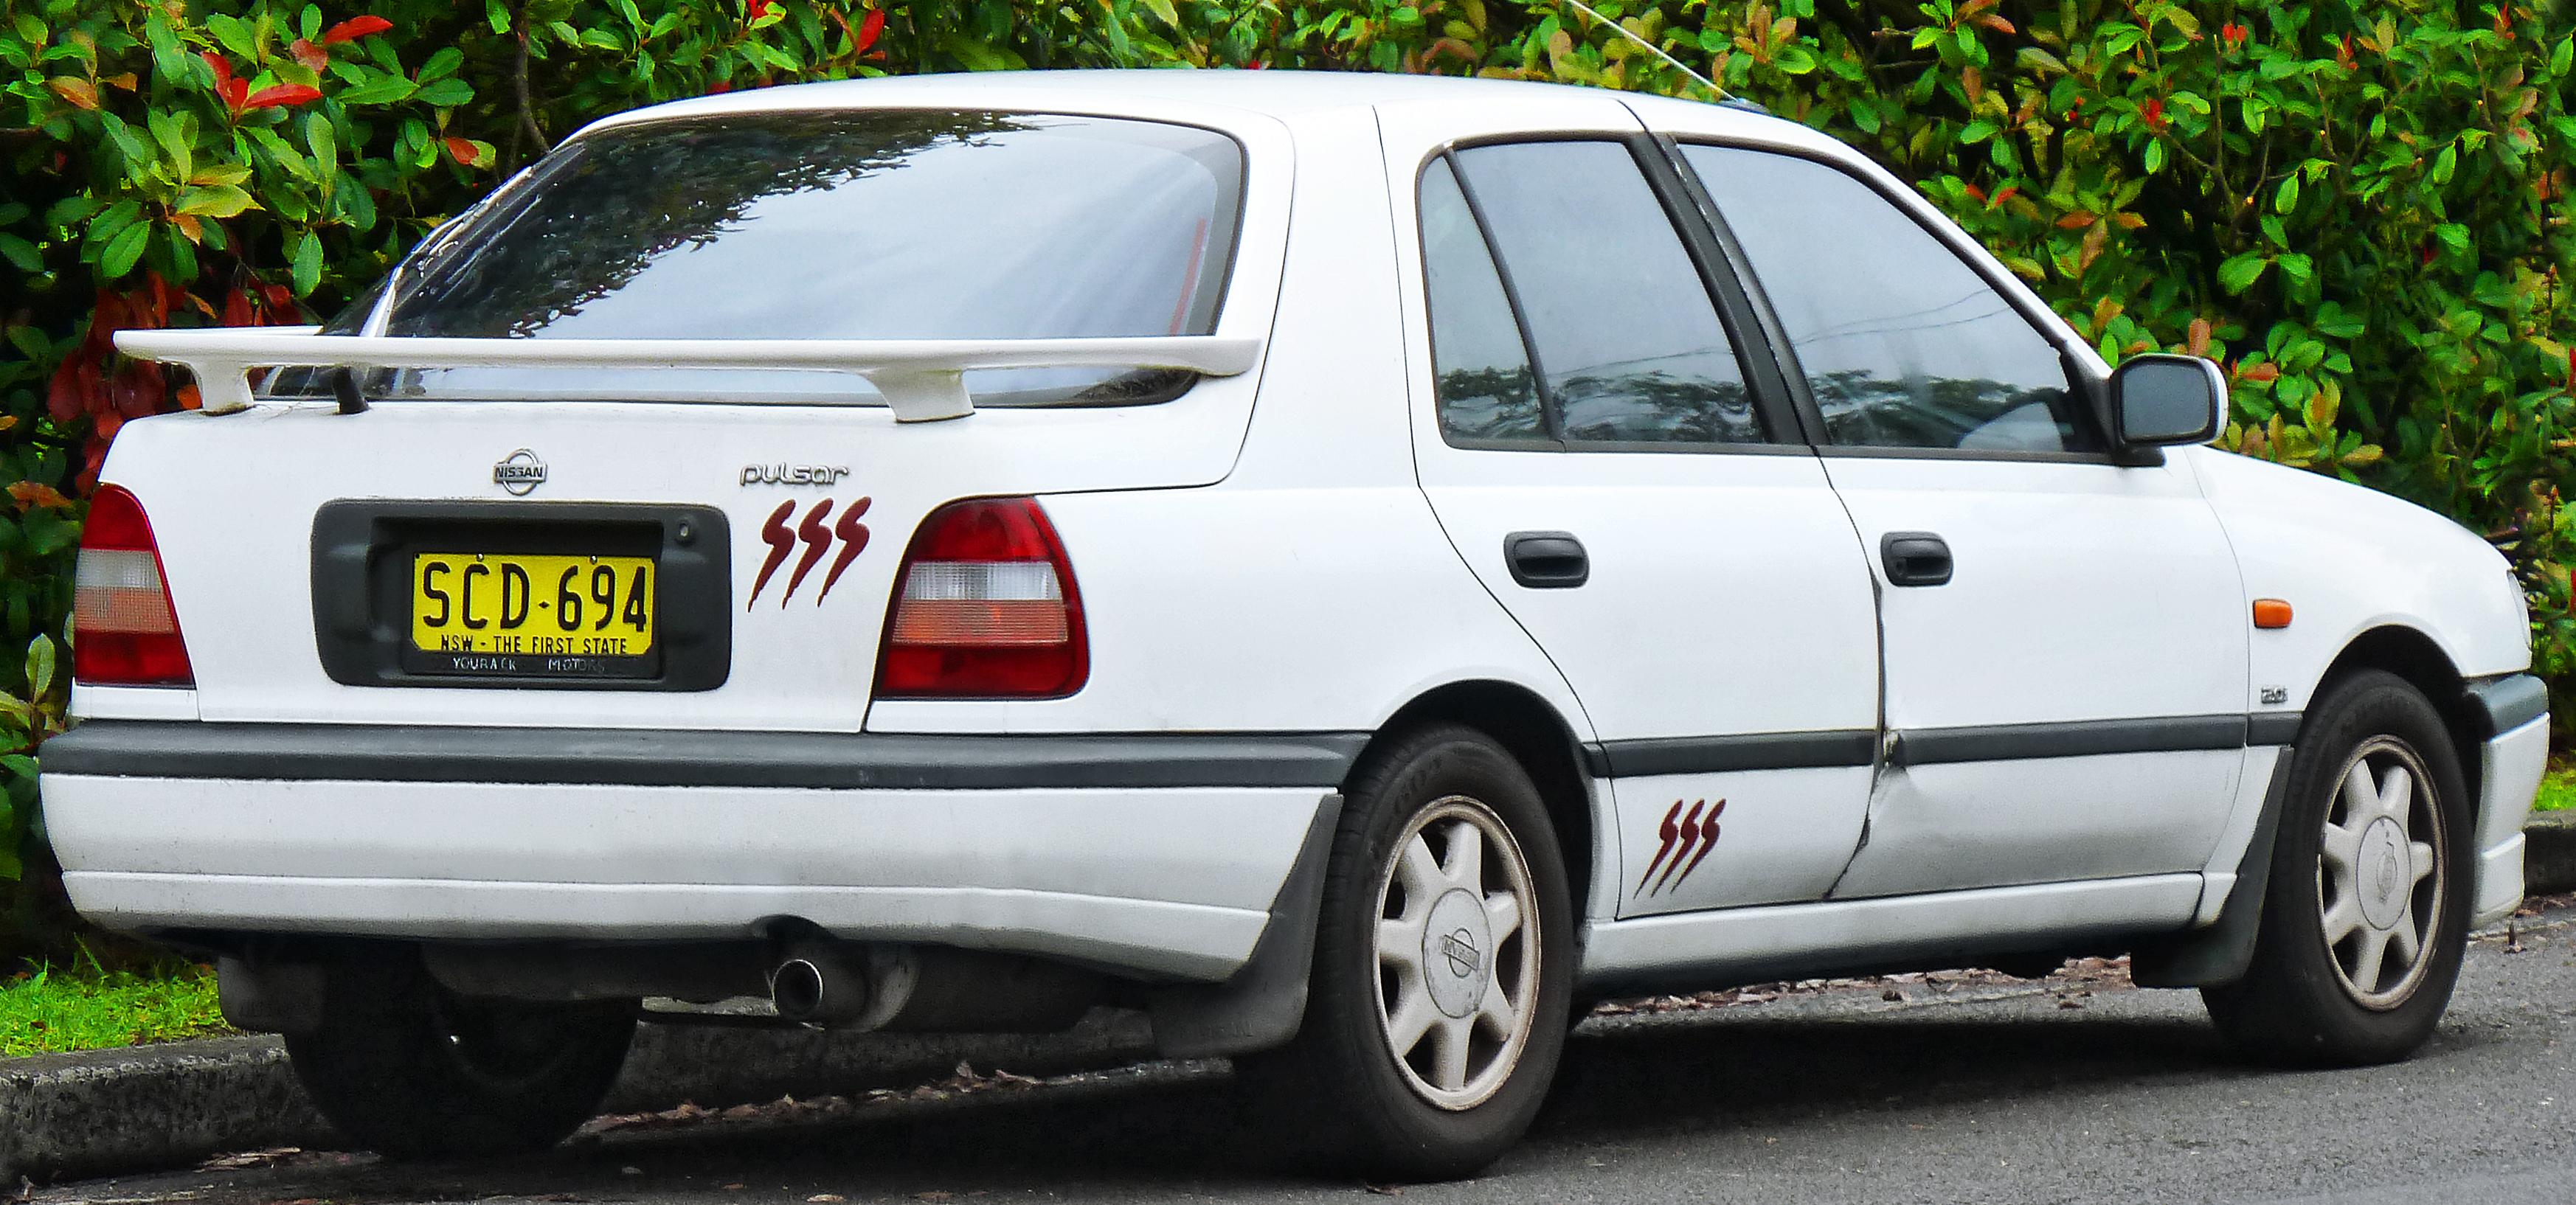 File 1991 1993 Nissan Pulsar N14 Es Sss 5 Door Hatchback 2011 11 18 02 Jpg Wikimedia Commons